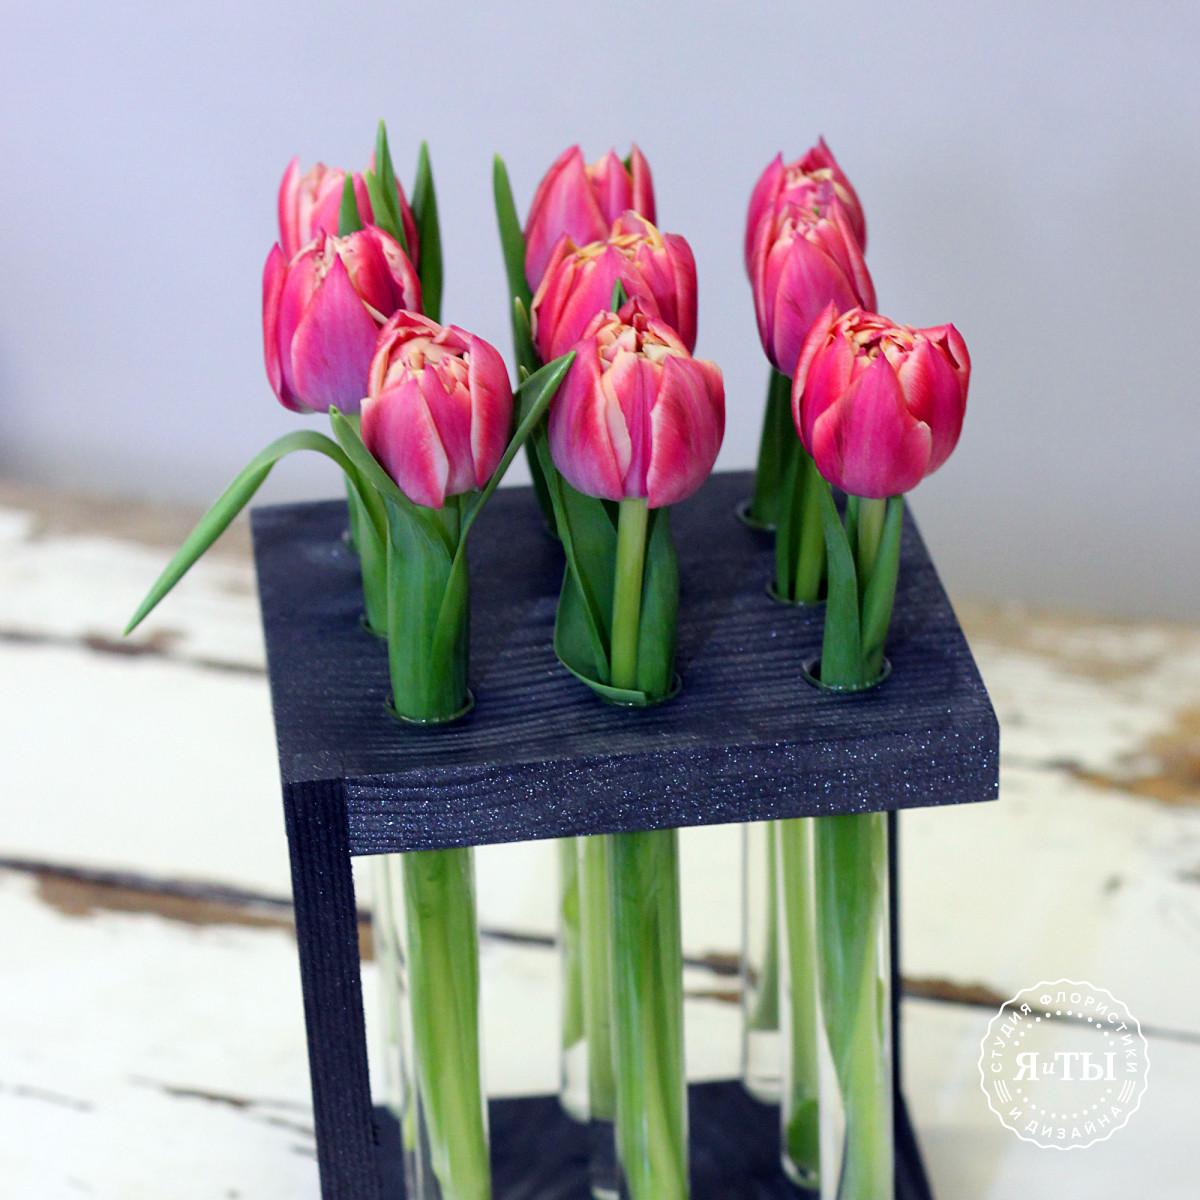 Тюльпаны в колбах (9 штук)